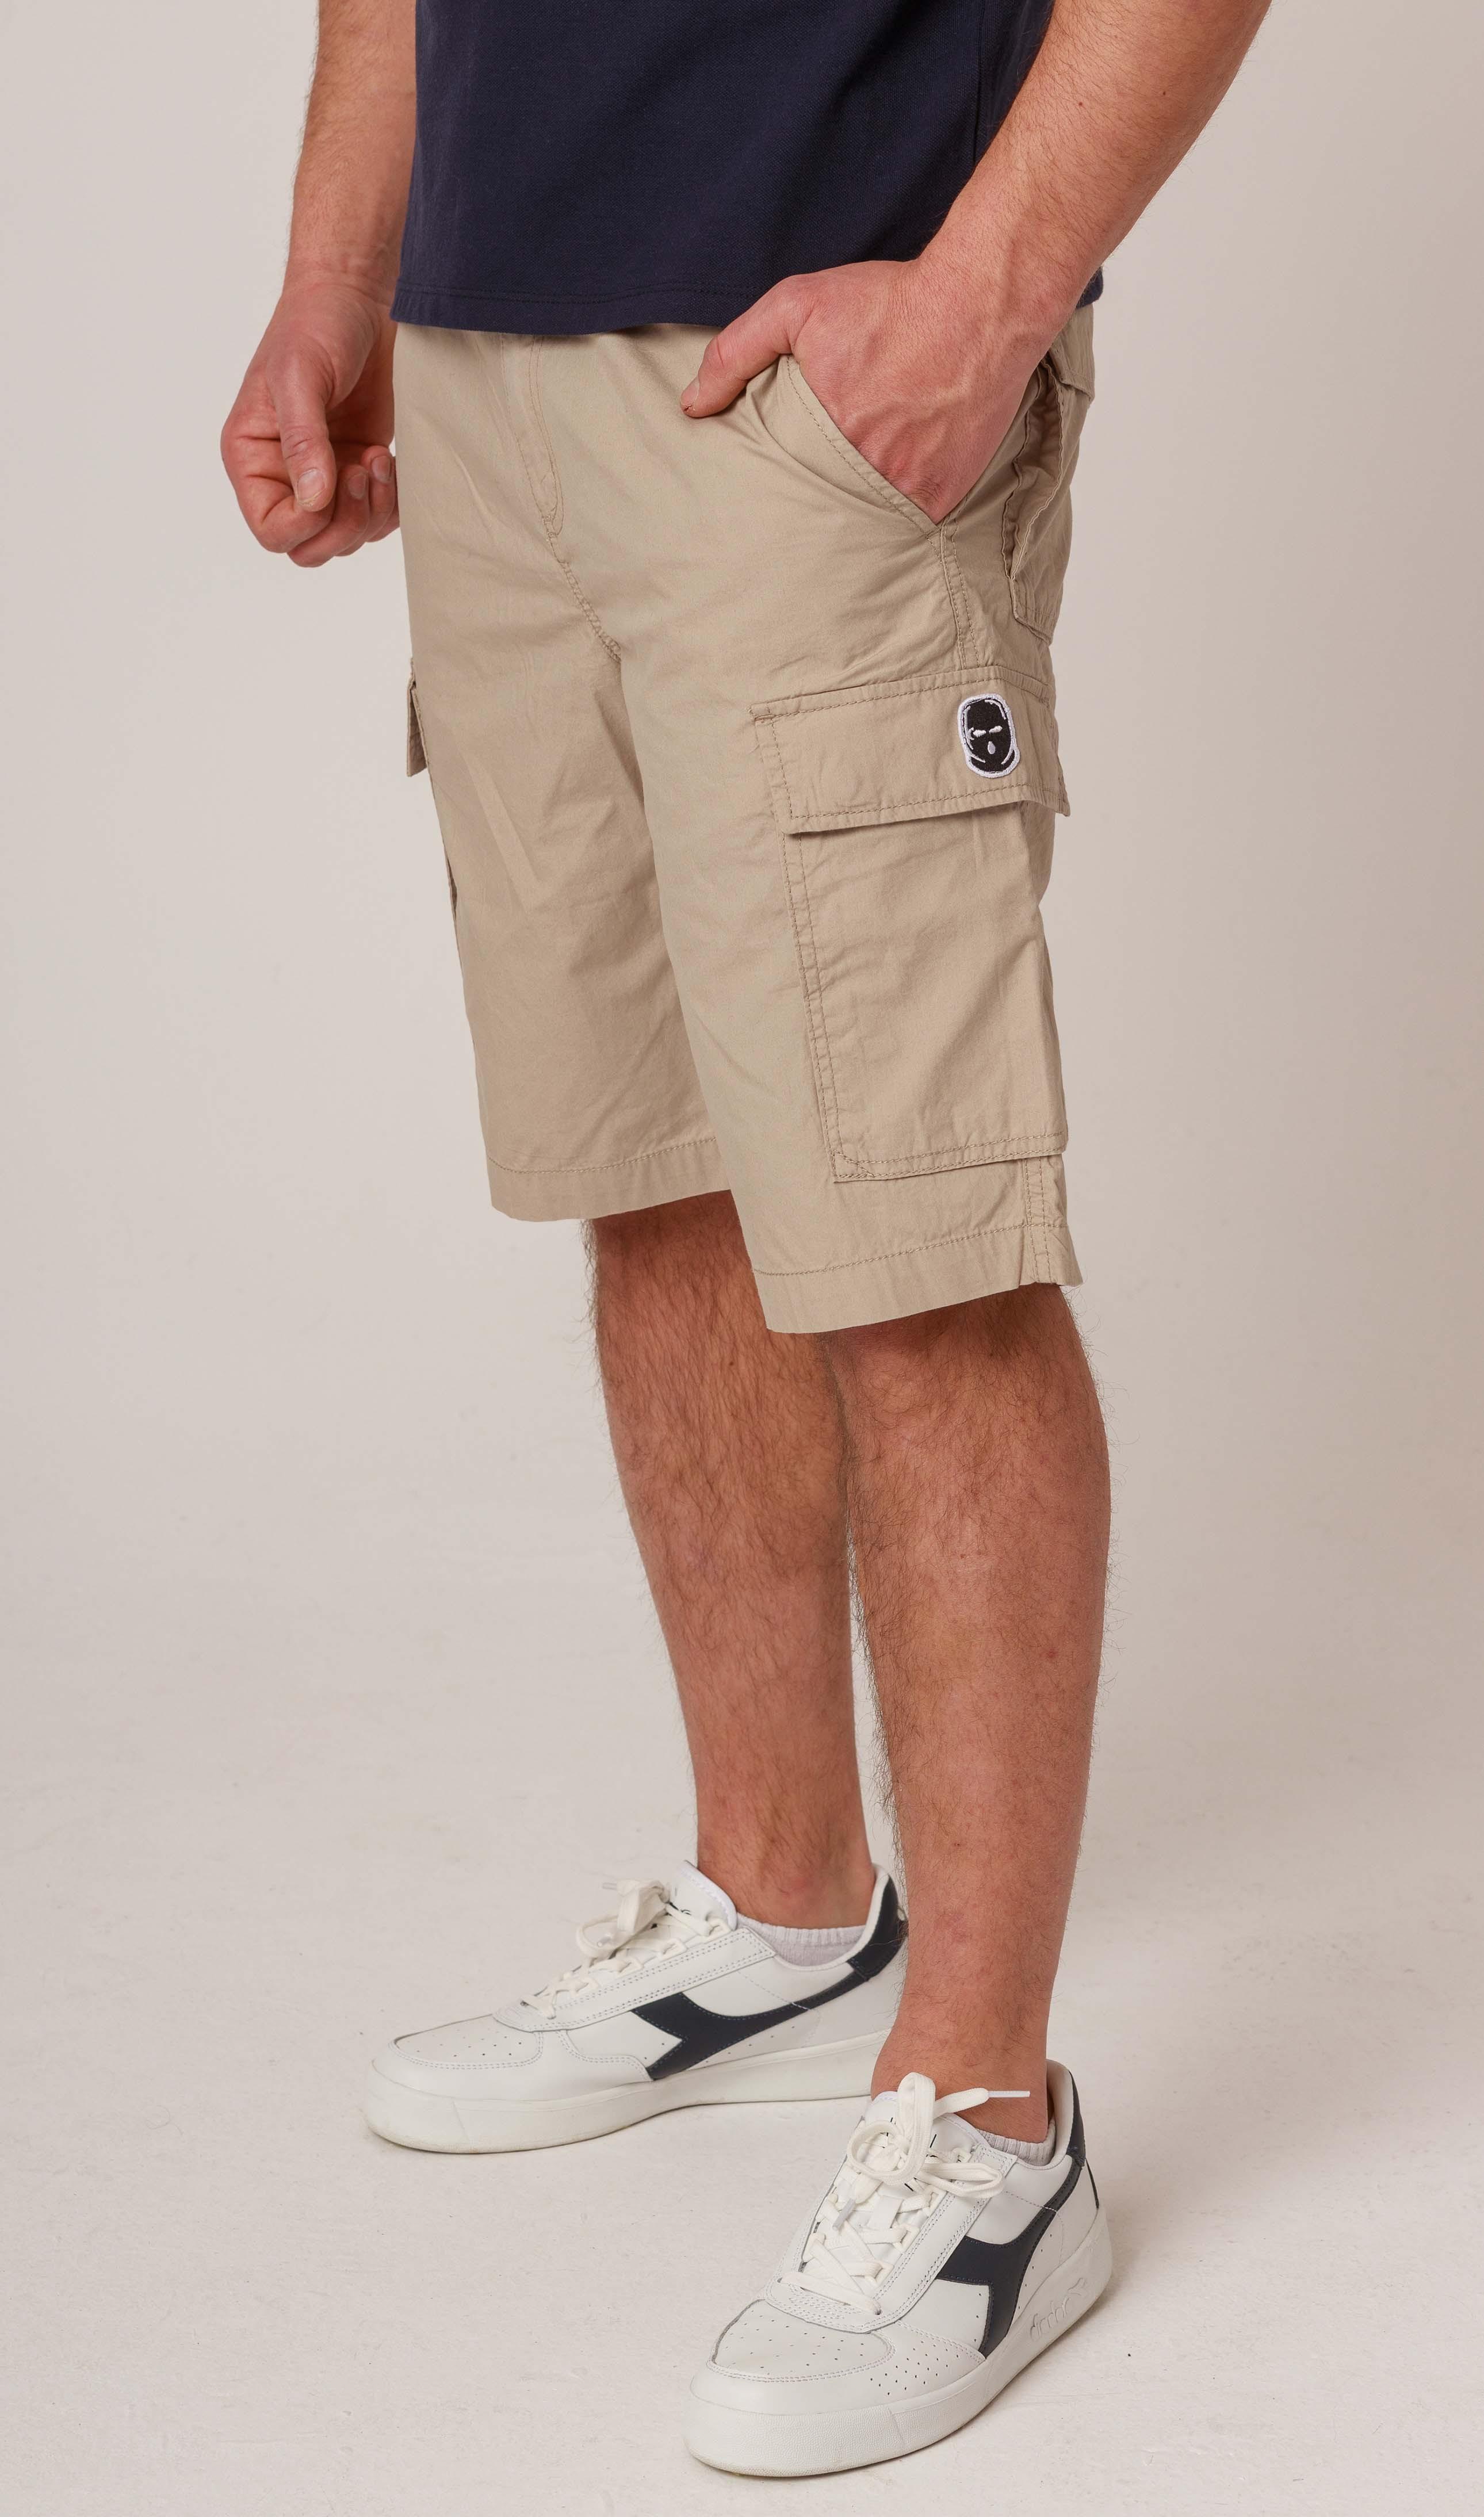 NRBSS202108 Cargo Shorts NO RESPECT Sand S